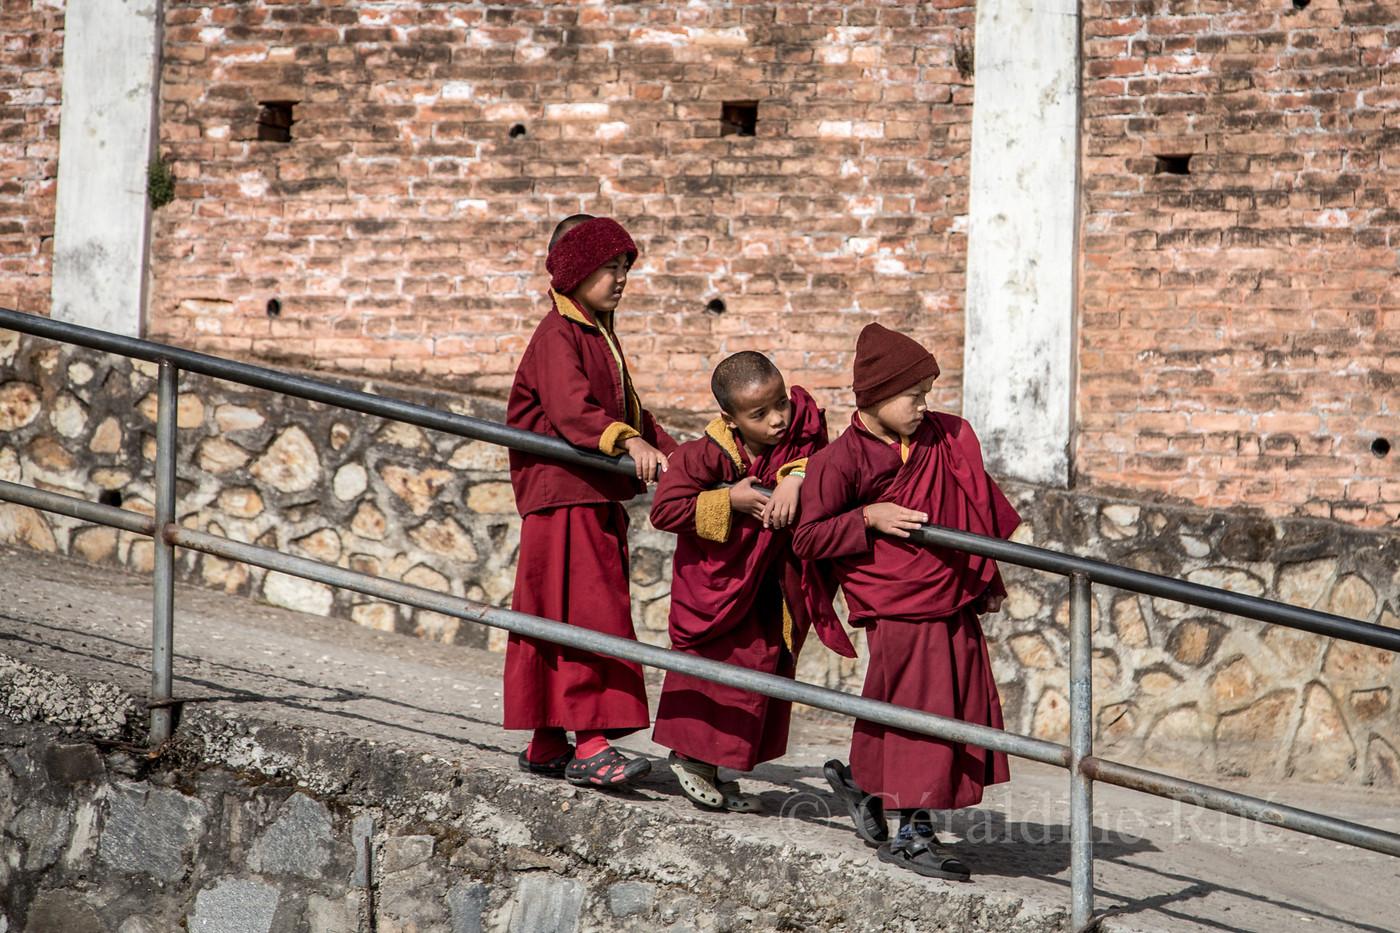 Népal 155777© Géraldine Rué.jpg